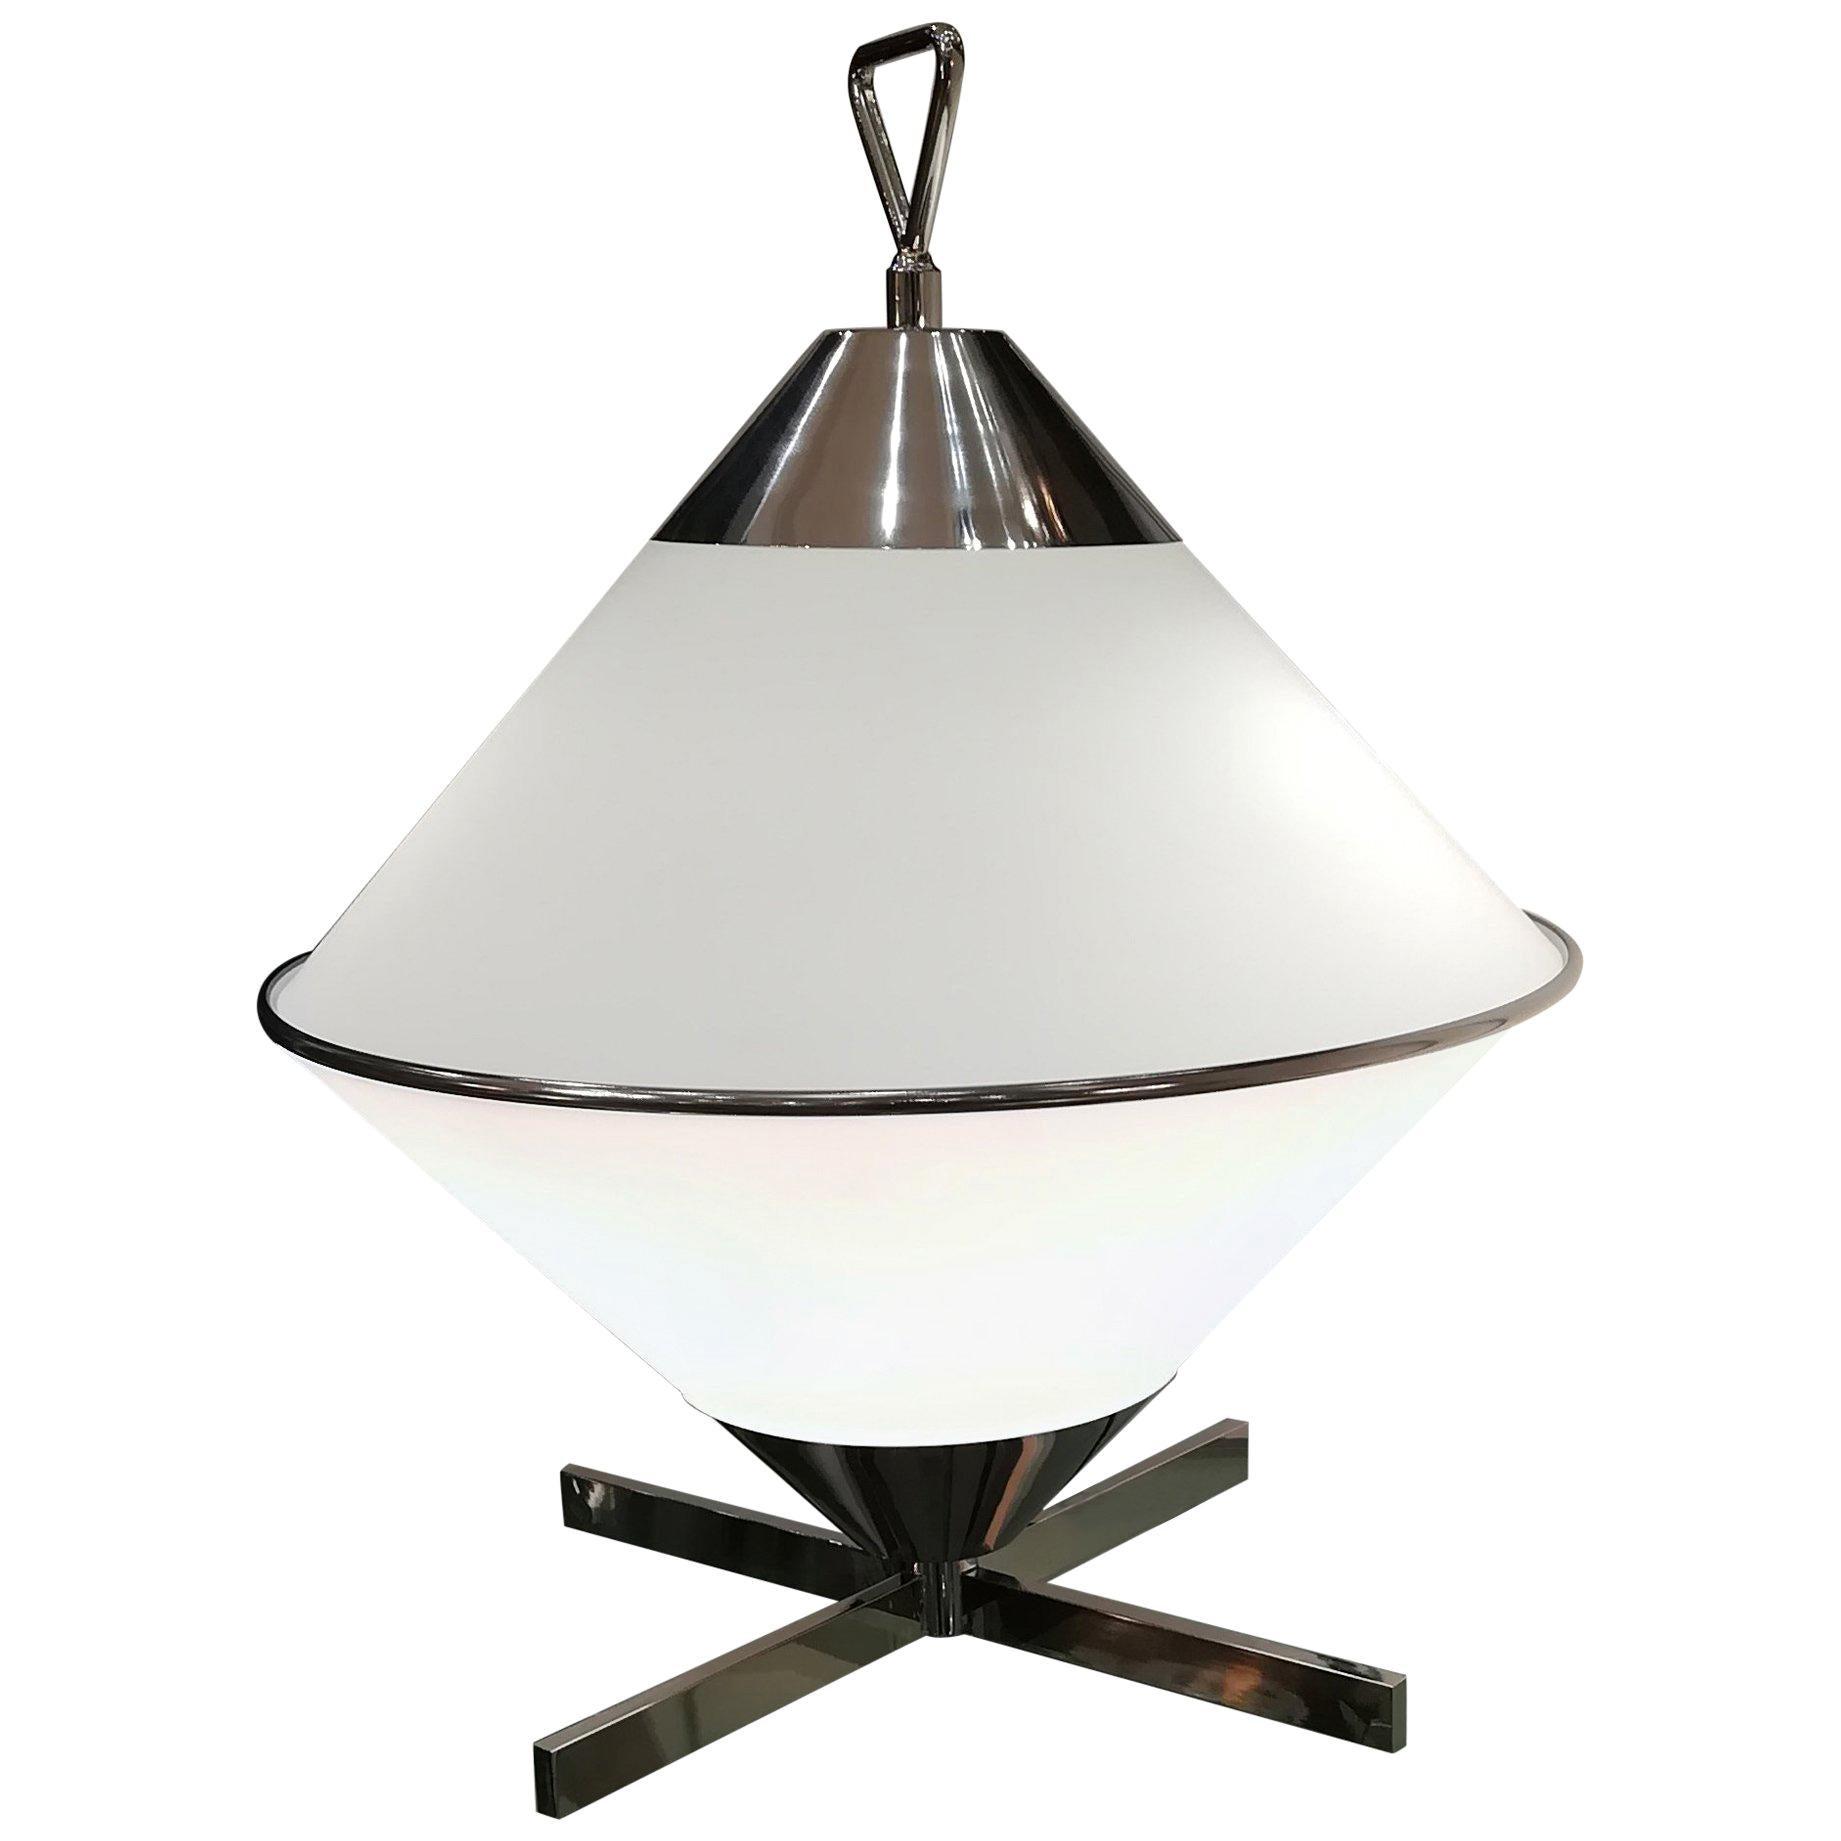 2000s Design Opaline and Chromium Table Lamp